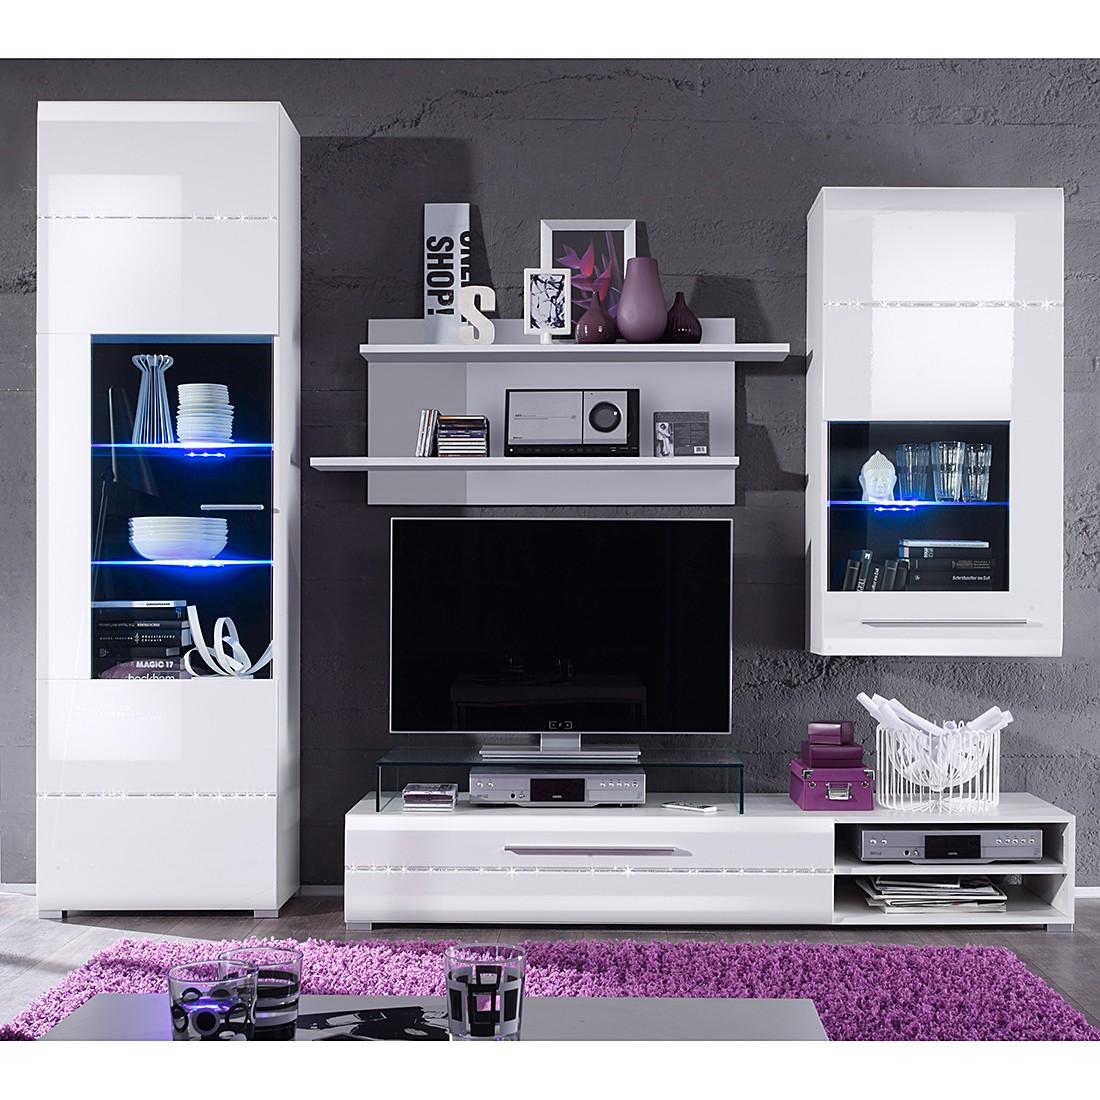 wohnwand tempo 4 teilig wei hochglanz strass glitzer applikation ohne beleuchtung. Black Bedroom Furniture Sets. Home Design Ideas